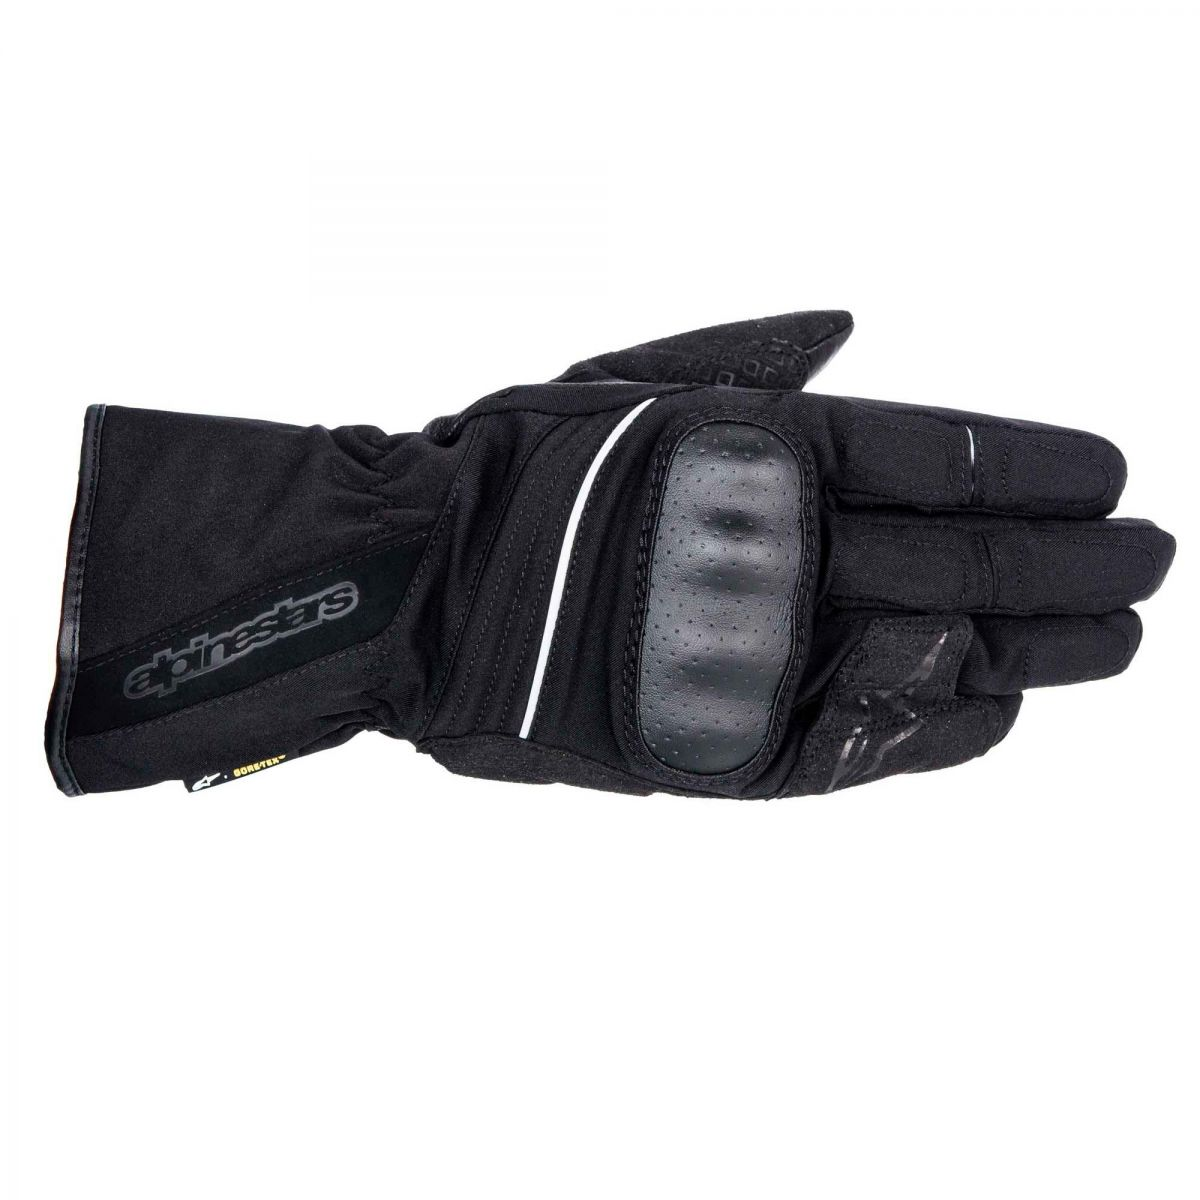 Luva Alpinestars Equinox X-trafit Gore-Tex® (LANÇAMENTO)  - Nova Suzuki Motos e Acessórios